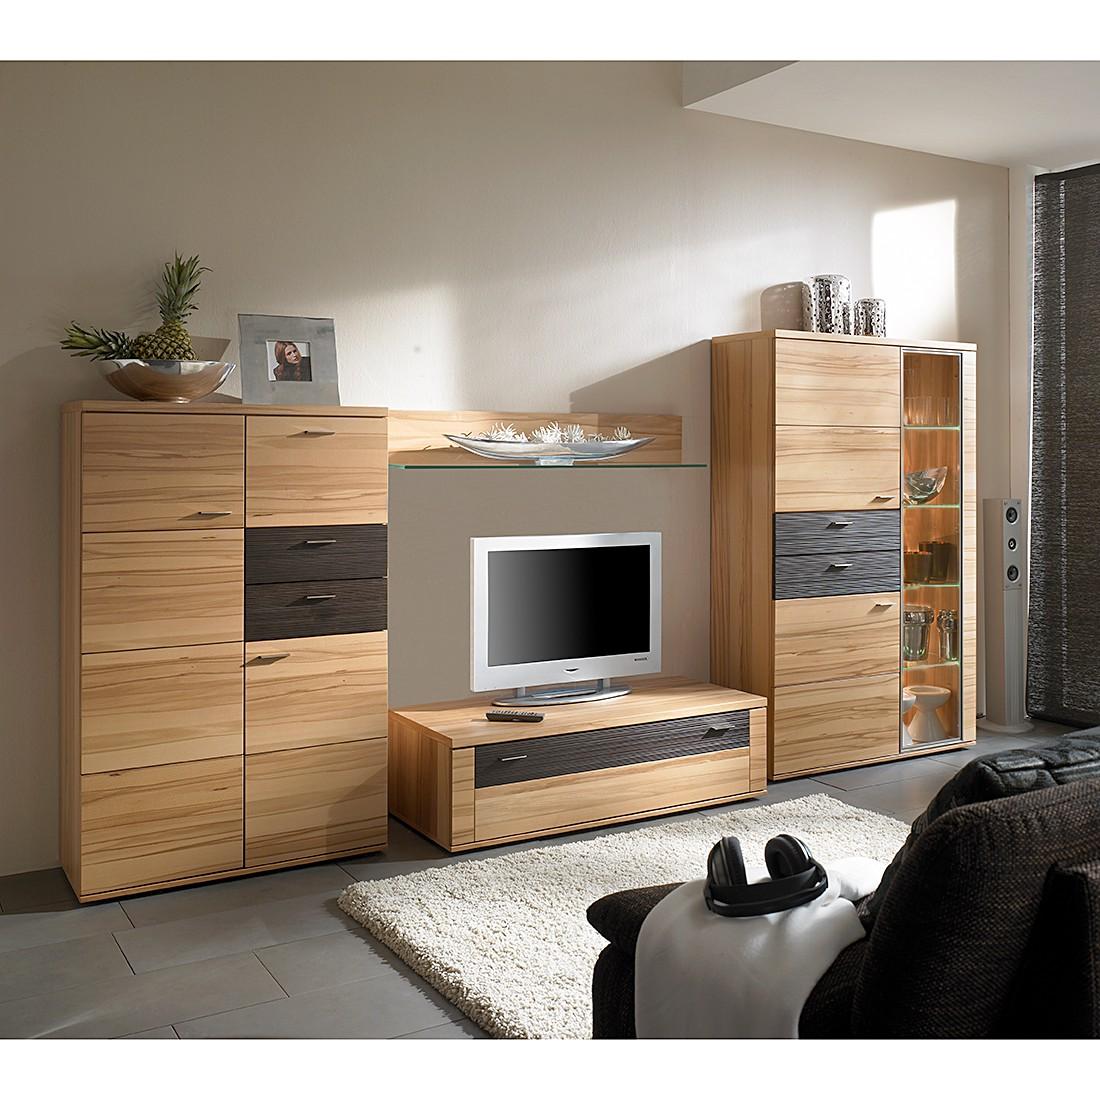 wohnwand vita ii 4 teilig kernbuche vitrinenelement rechts ohne beleuchtung ohne tv. Black Bedroom Furniture Sets. Home Design Ideas